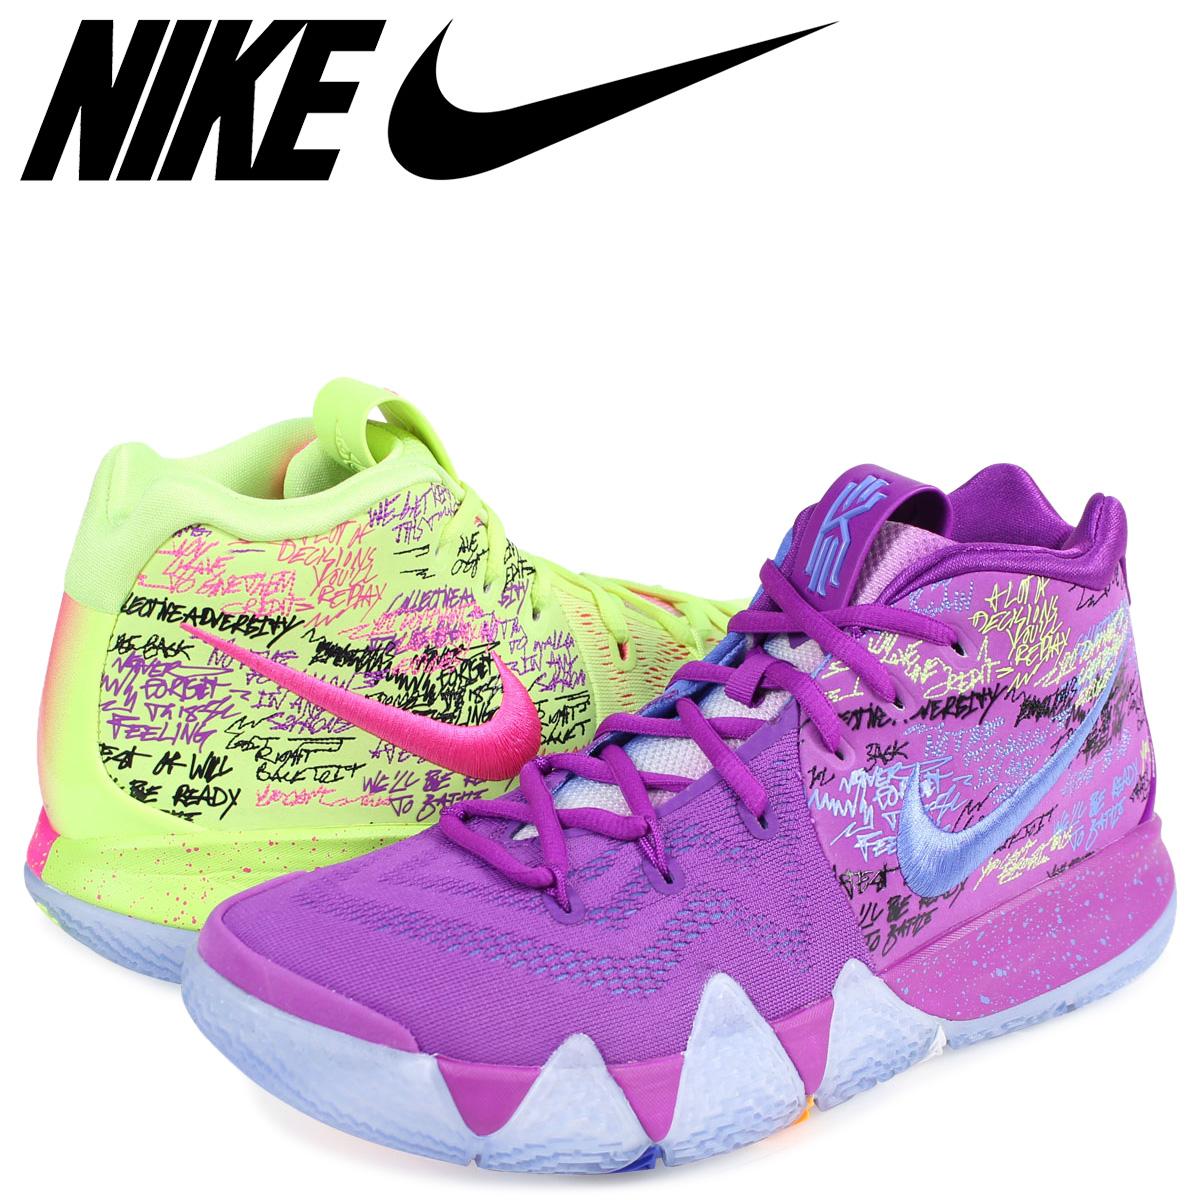 a8d646185b40 ... hot nike kyrie 4 ep confetti nike chi lee 4 sneakers men aj1691 900  dcb13 aef01